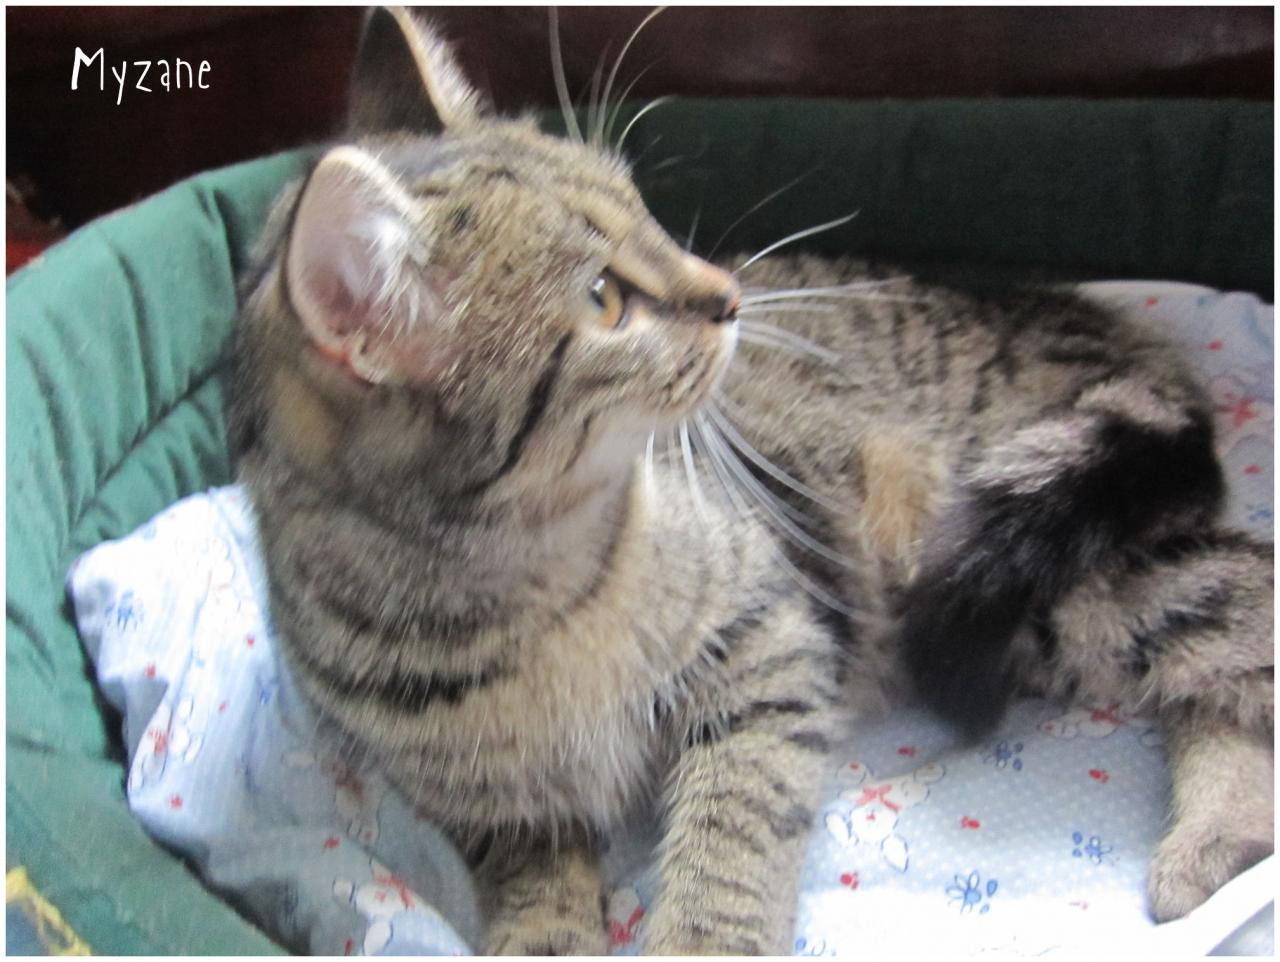 MYZANE - F - Née le 01/01/2015 - Adoptée en mars 2016